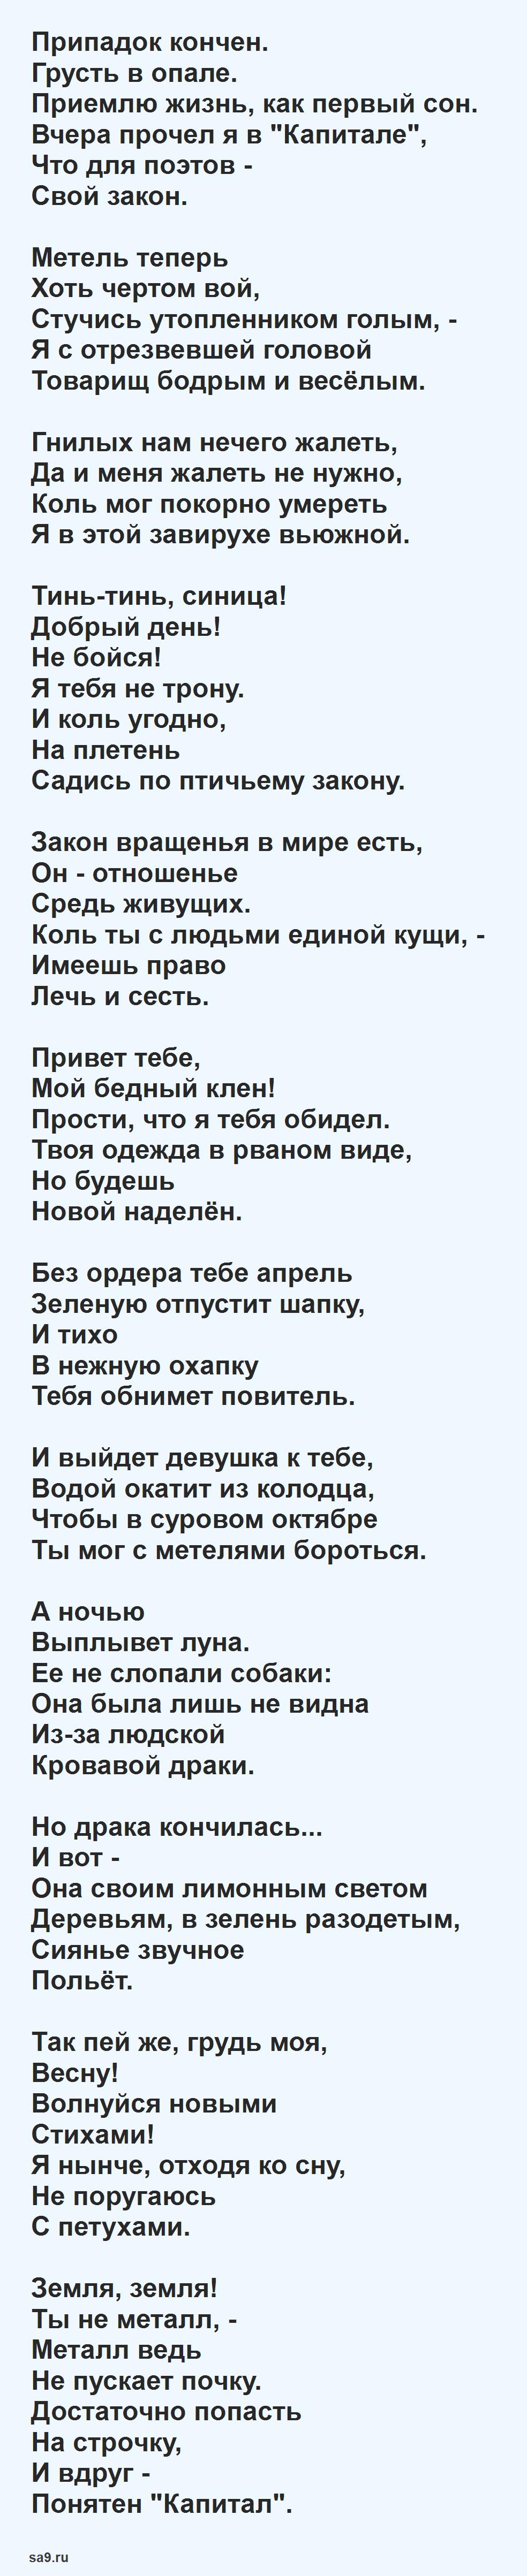 Стихи Есенина о природе - Весна